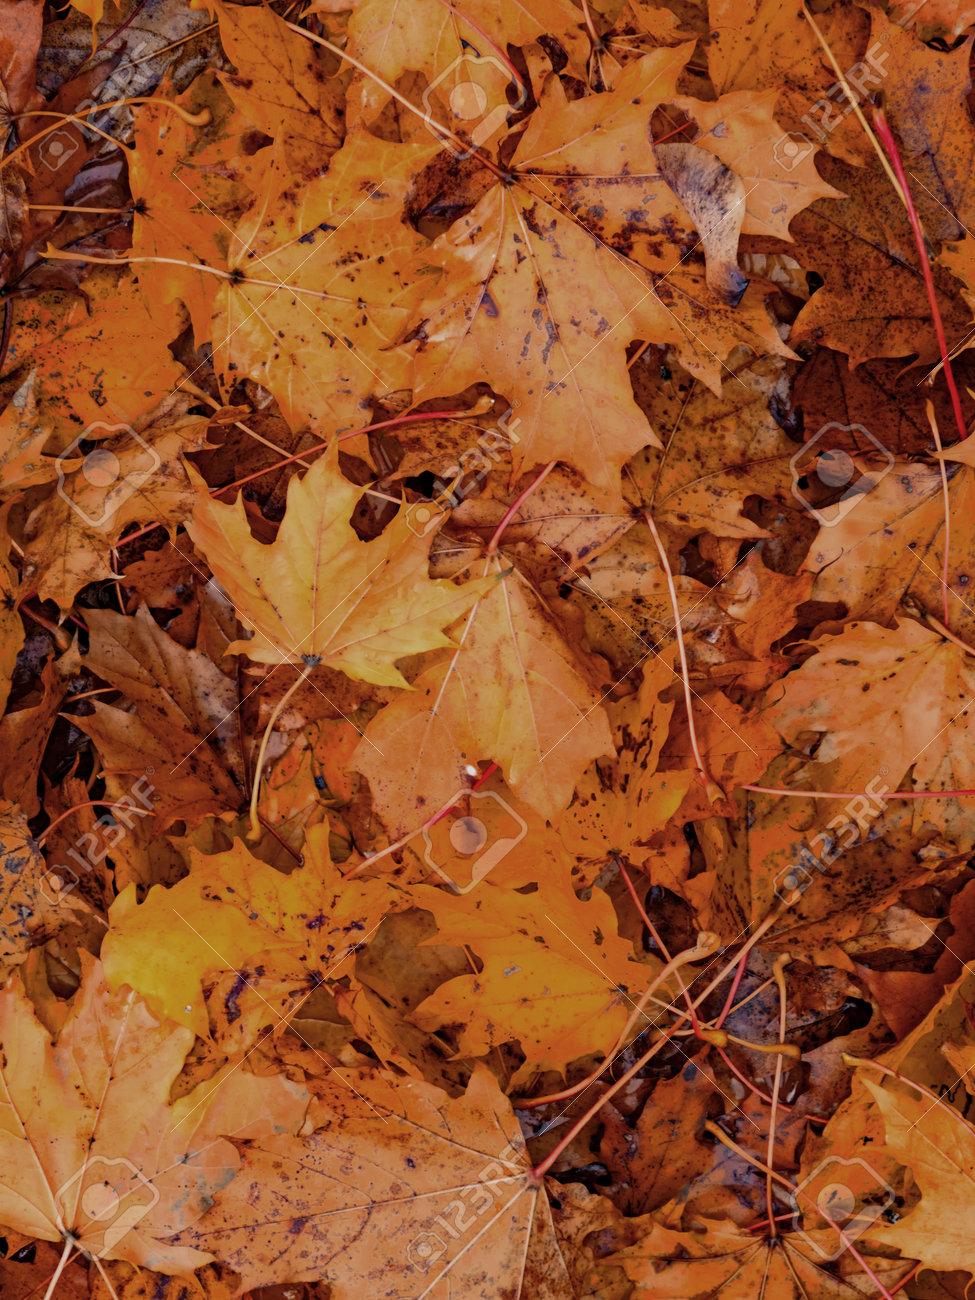 Colorful seasonal autumn background pattern, carpet of fallen maple leaves. - 163004254